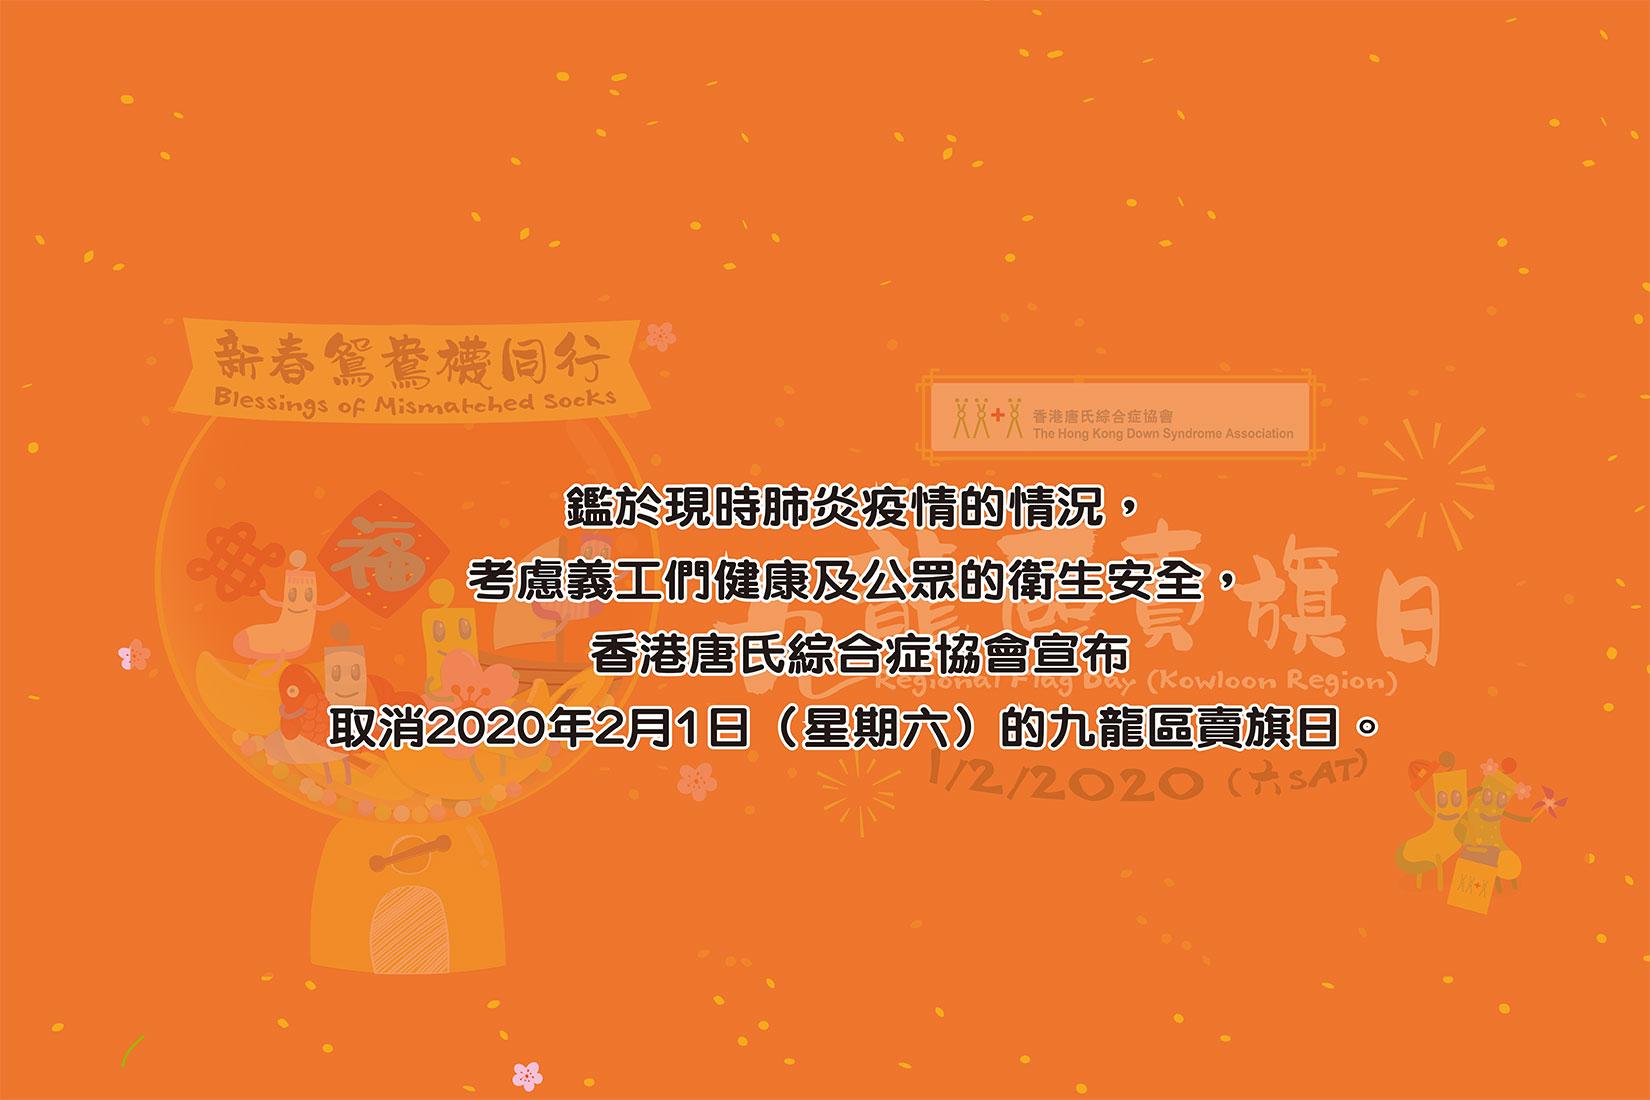 web-banner-cancel